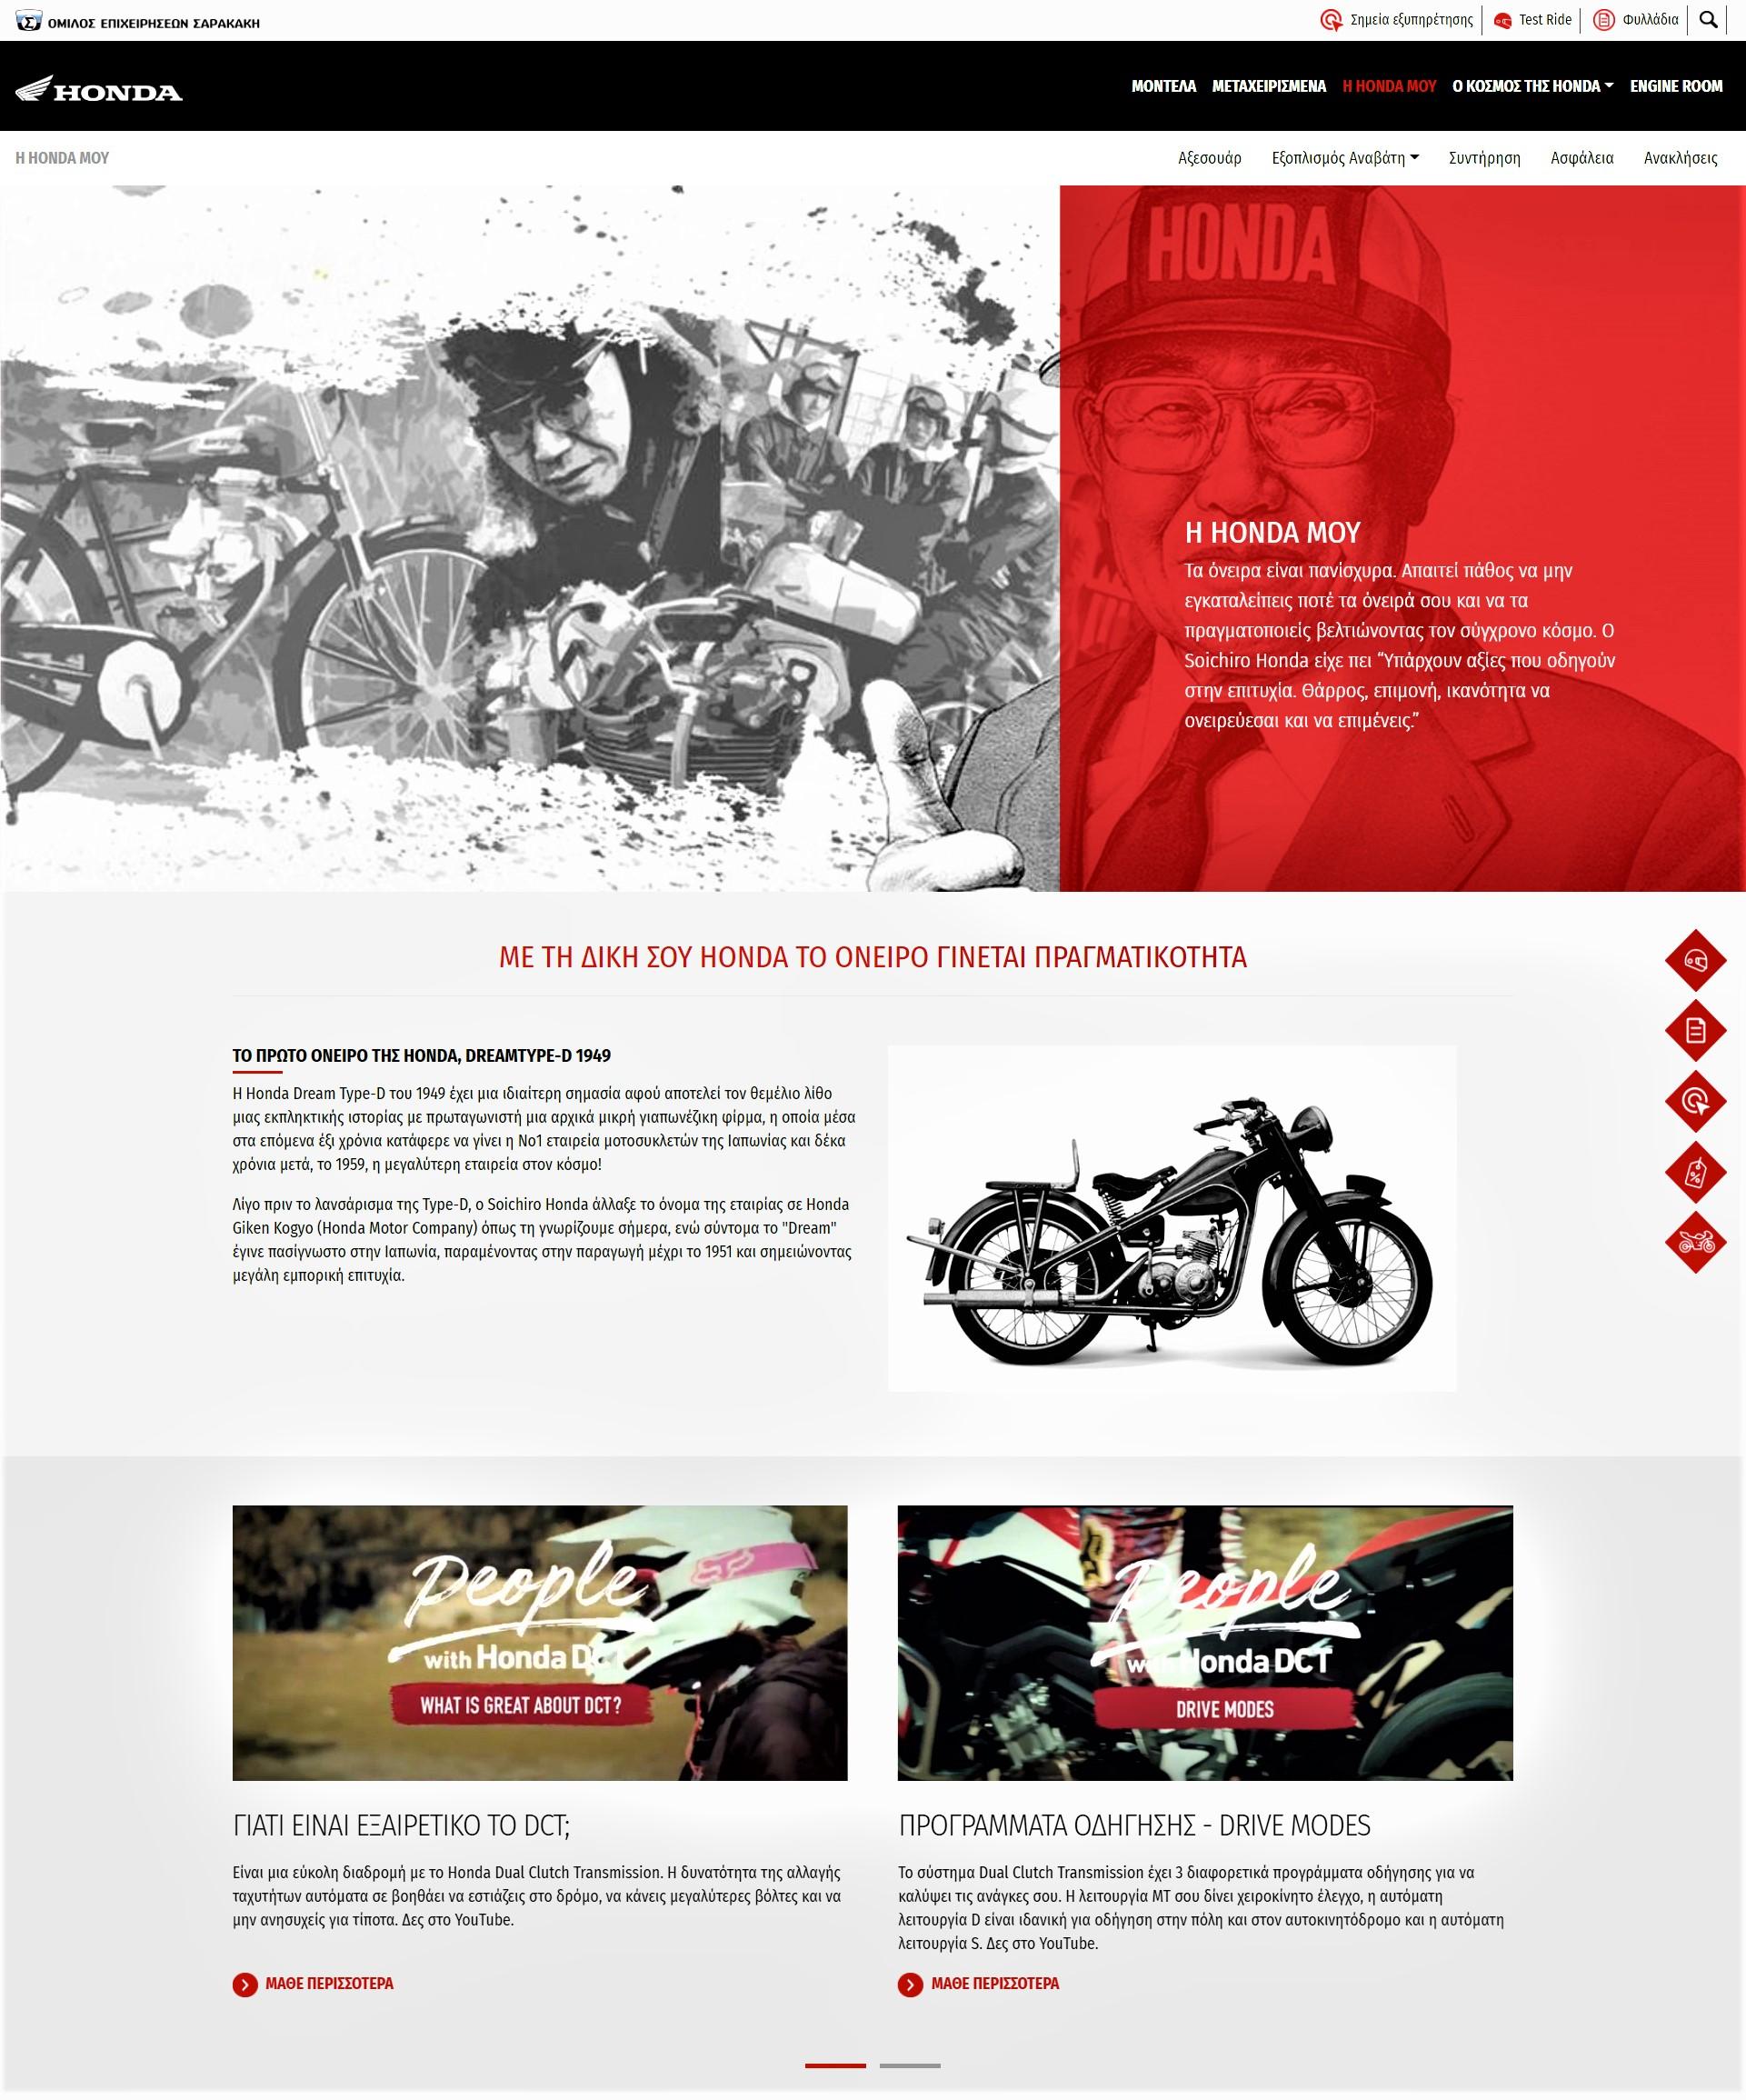 MY HONDA honda motorcycles gr my honda 2021 06 22 14 54 44 Είδατε το Νέο Website της Honda; Honda, ειδήσεις, Νέα